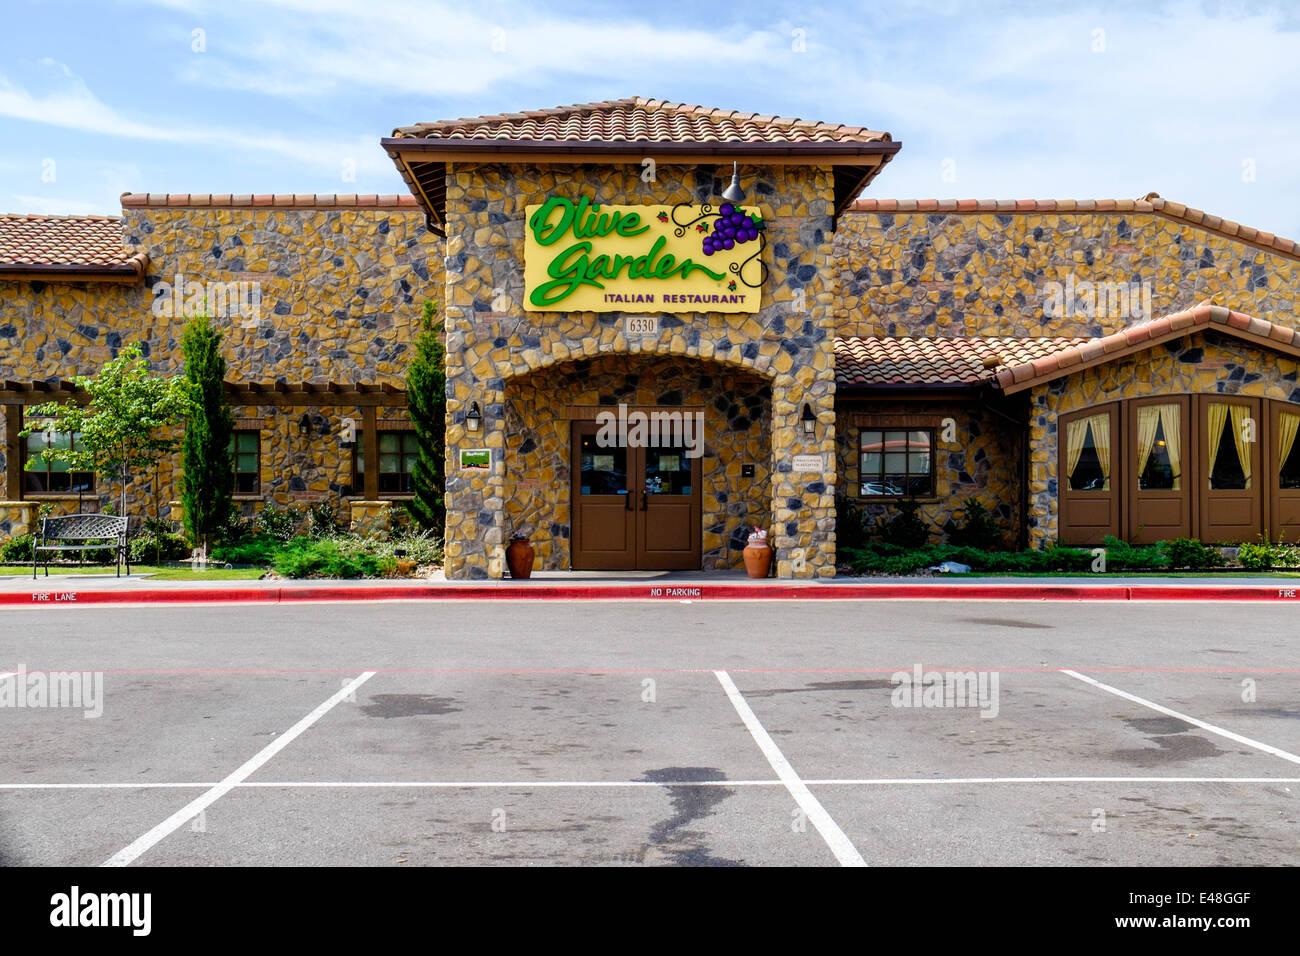 Baltimore Italian Restaurant Locations Olive Garden 6115663 ...